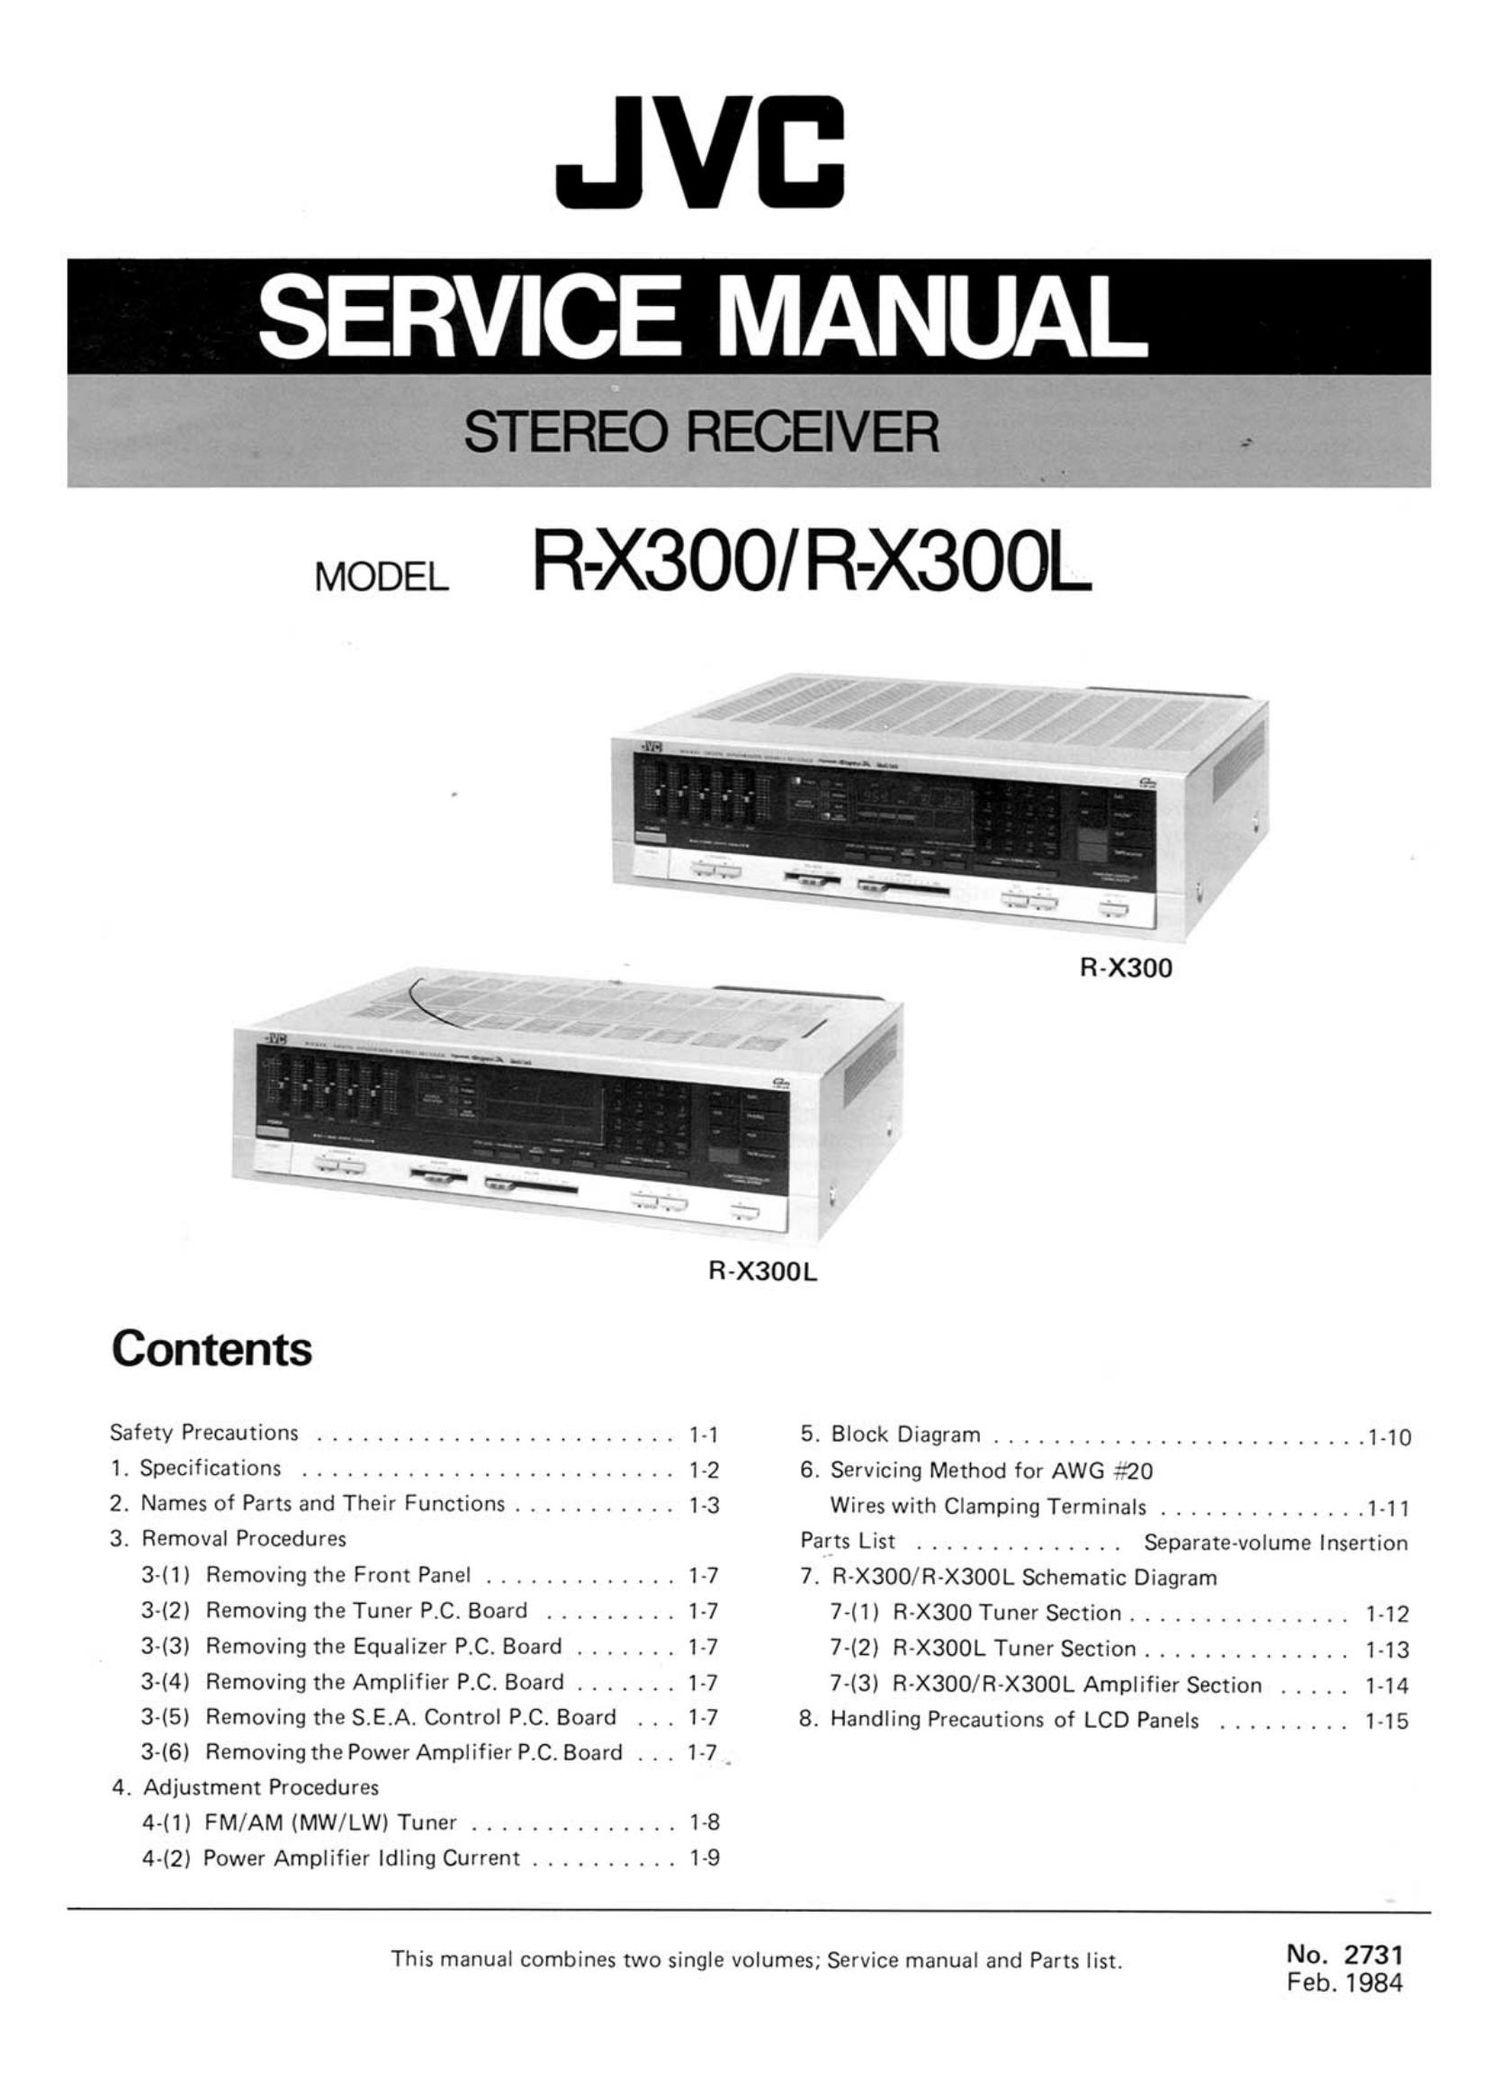 JVC RC-X510 SERVICE MANUAL Pdf Download | ManualsLib